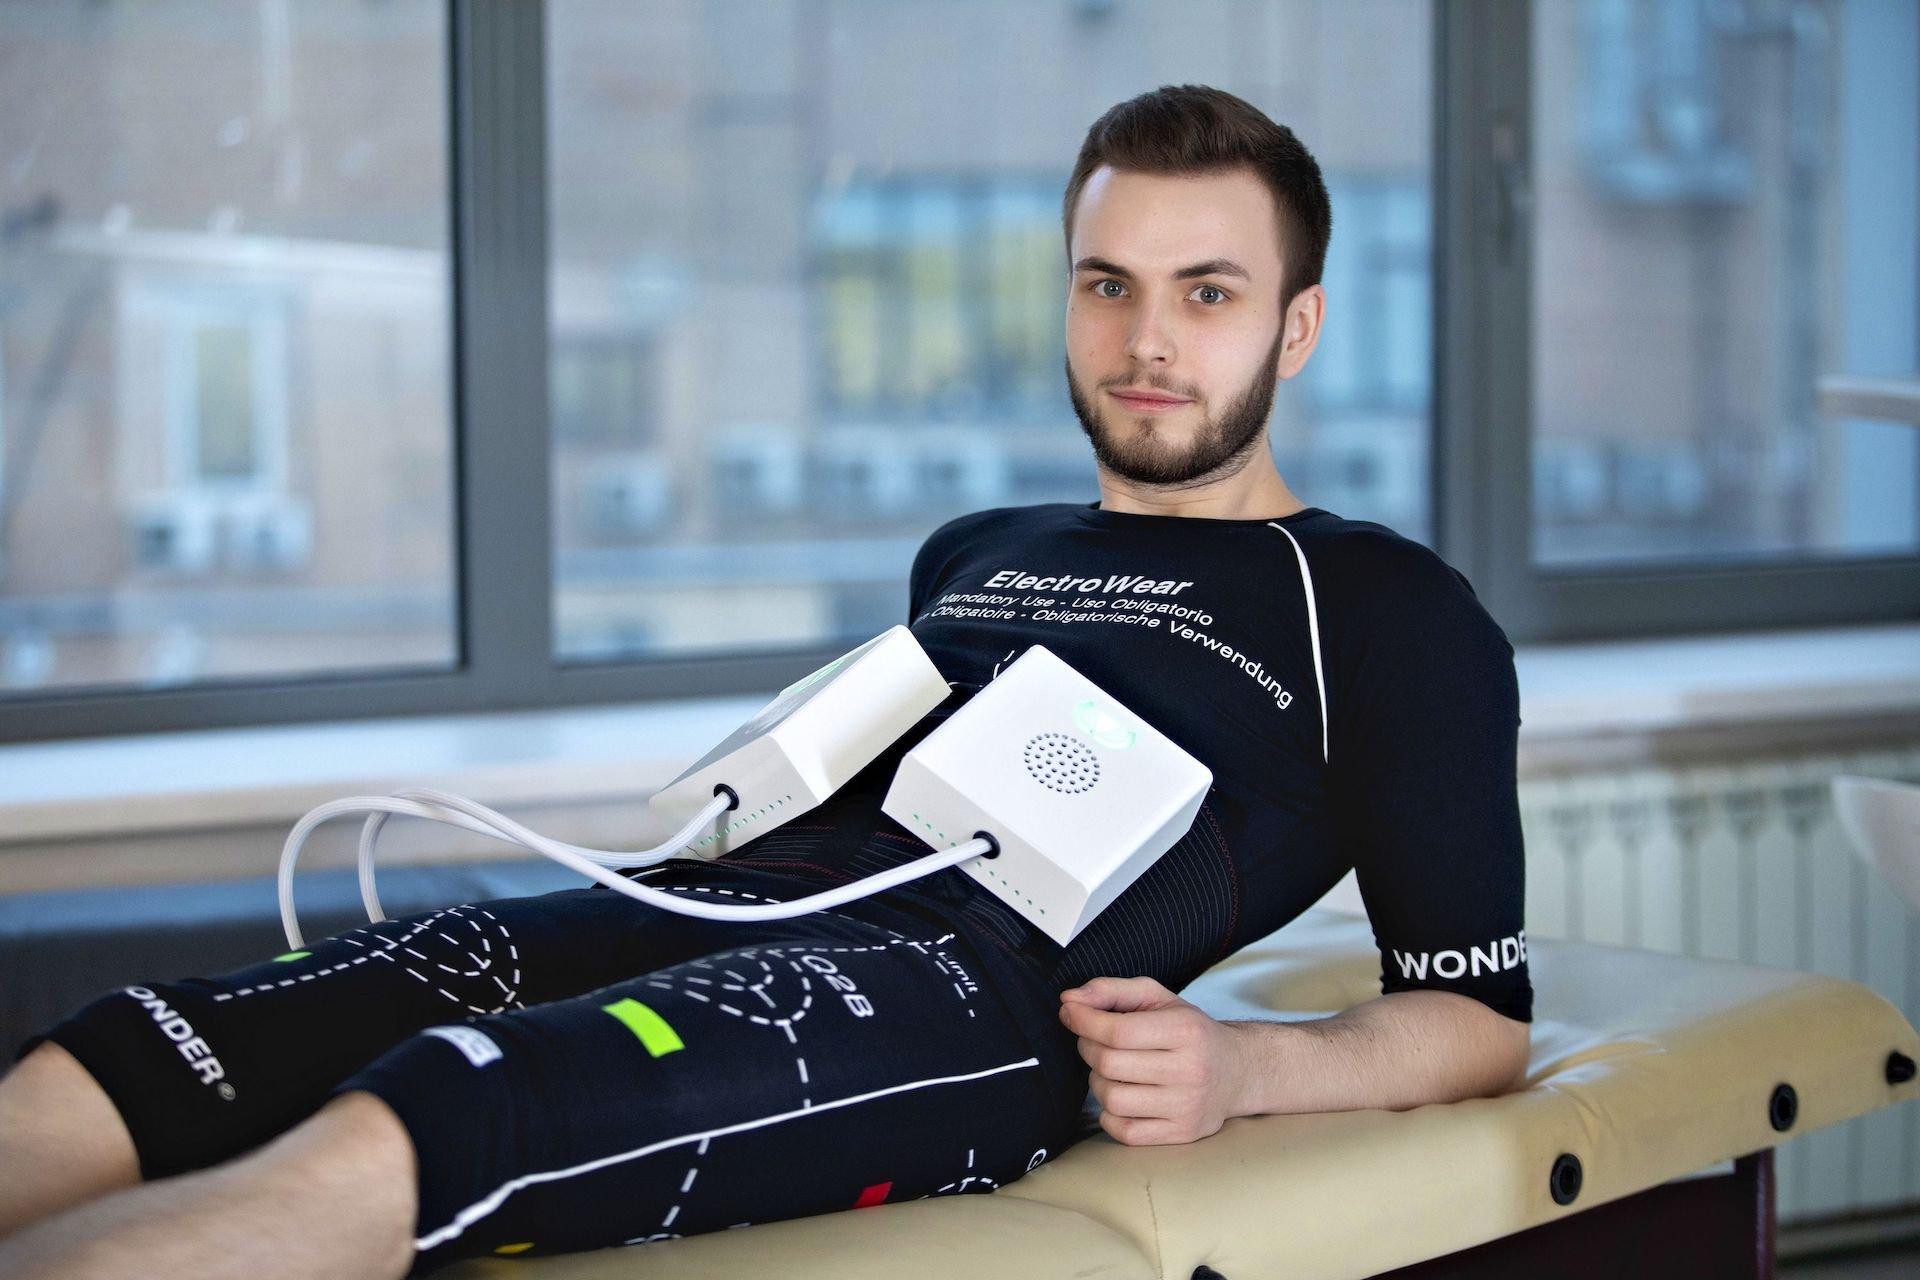 electrostimulation stimulation electromagnétique Organicare exclusive distributor of WONDER in Morocco